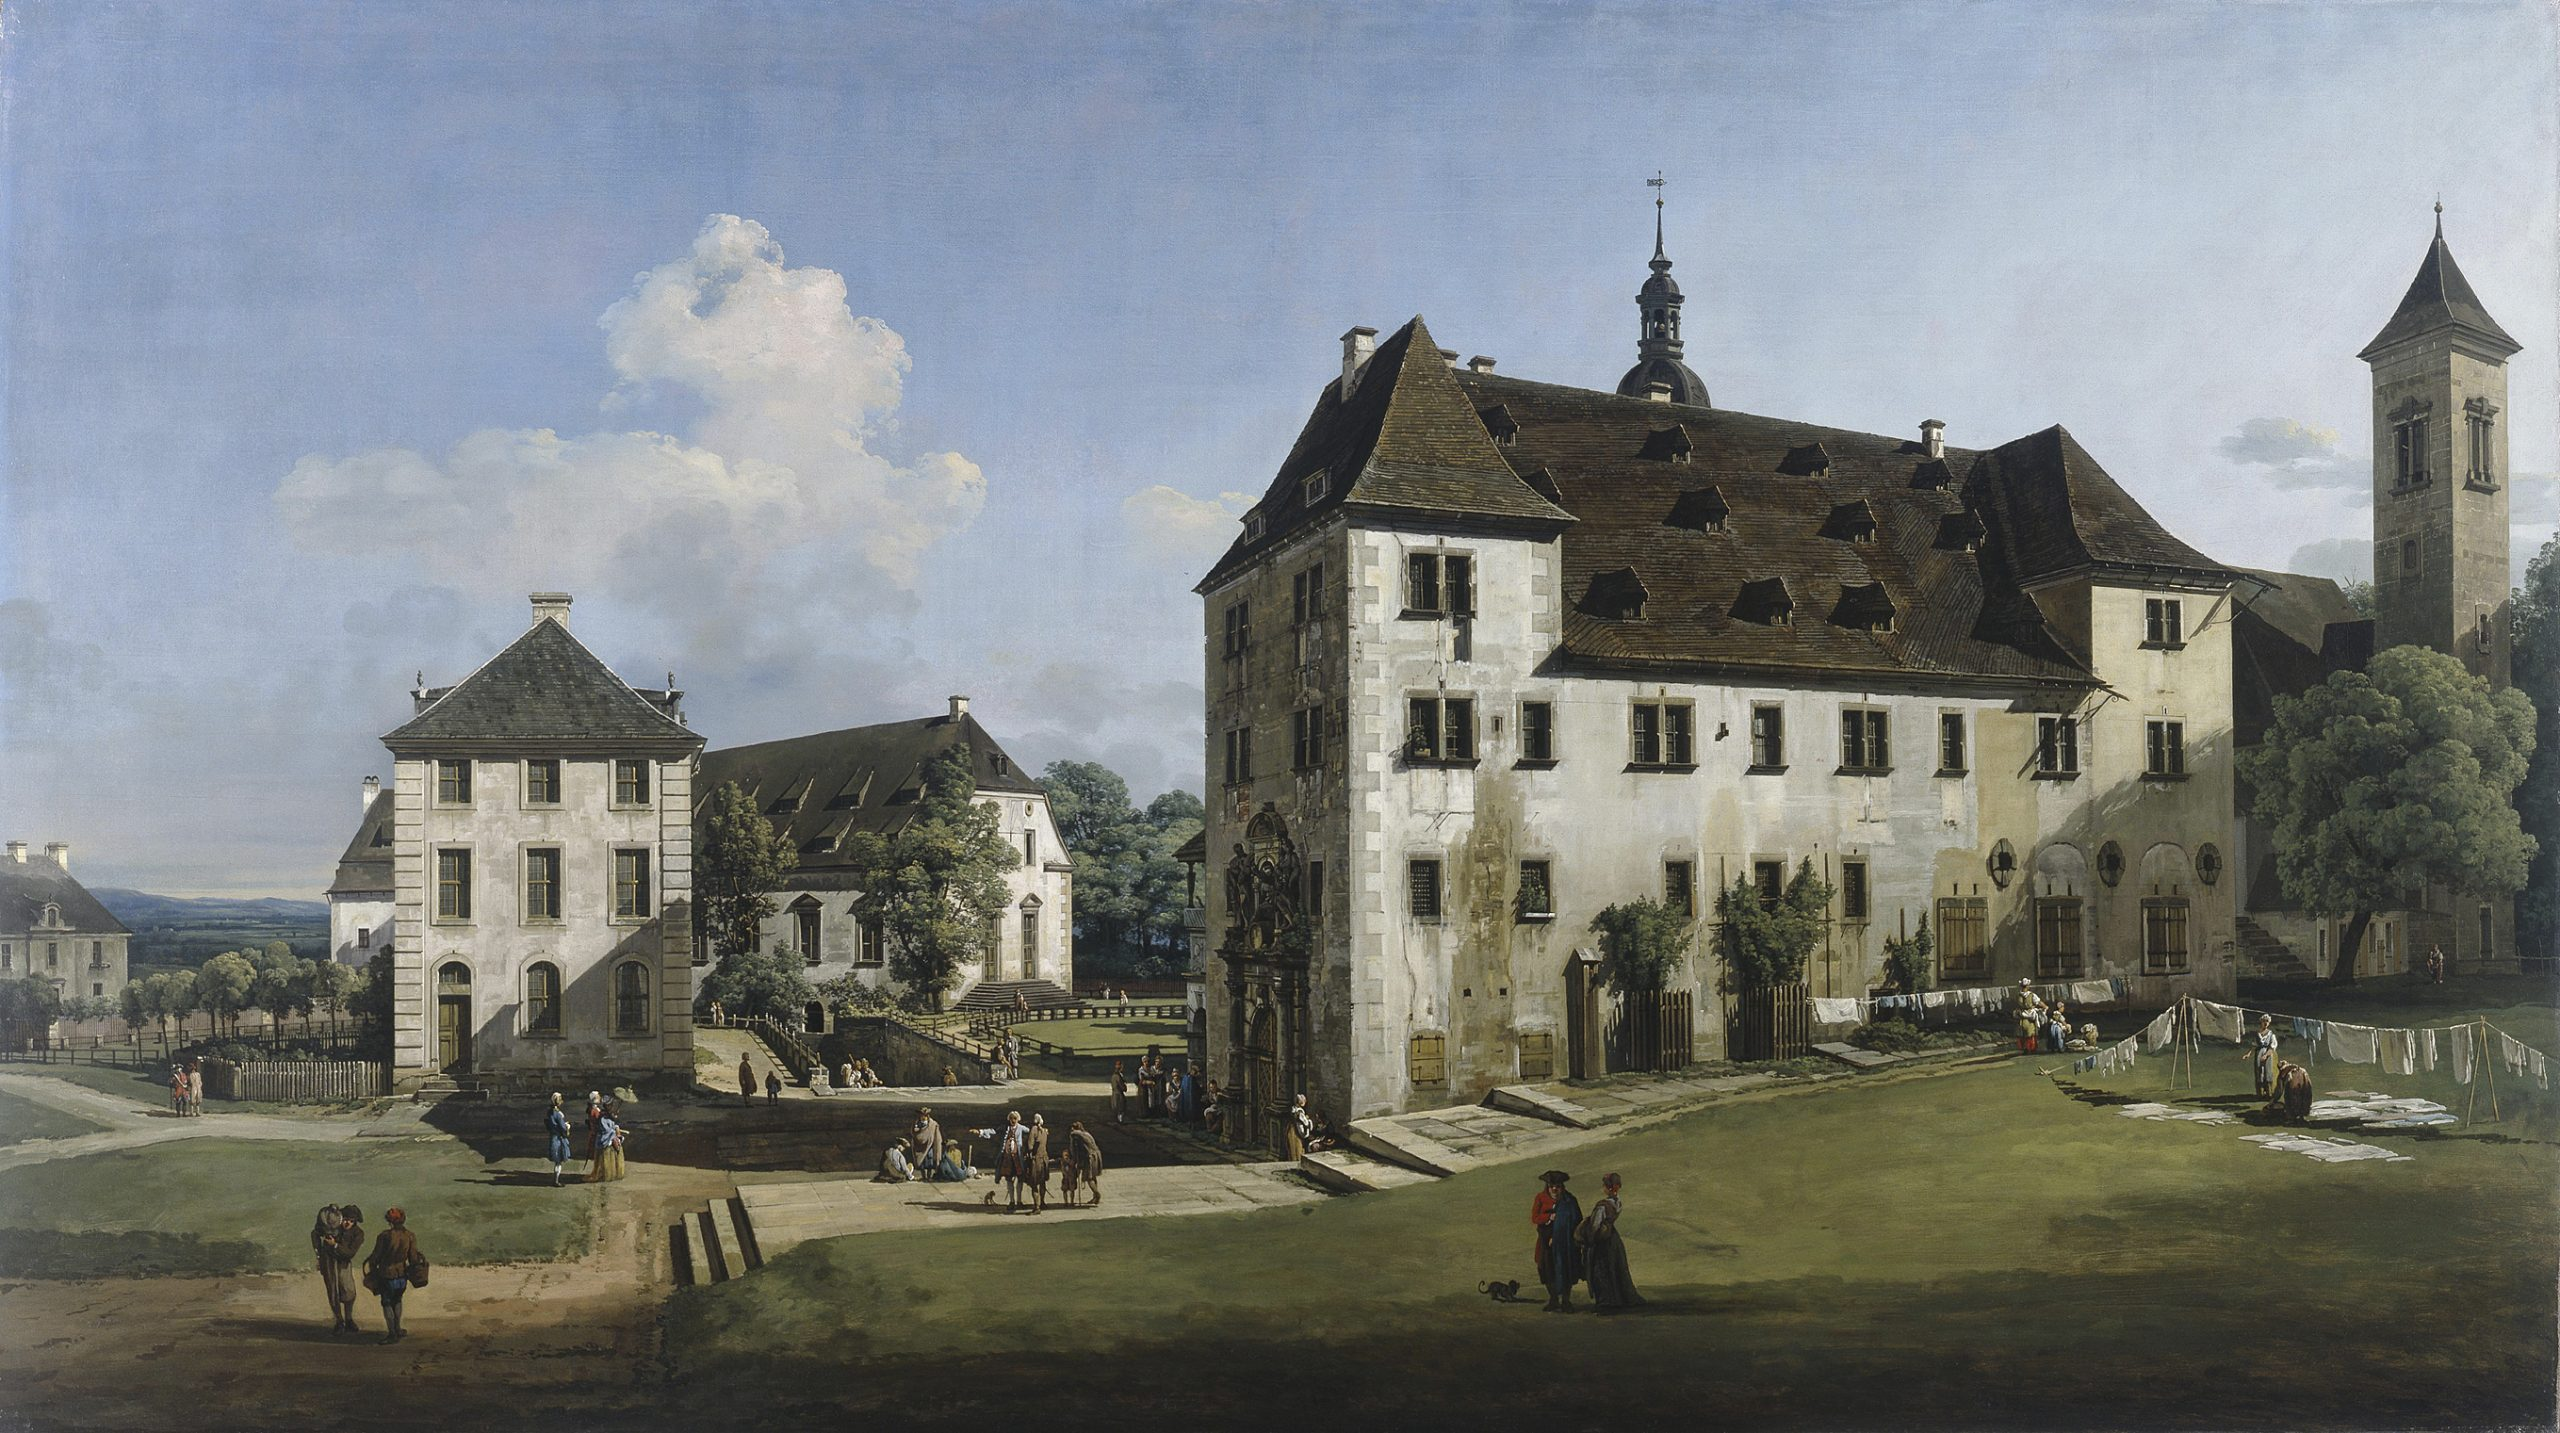 Bernardo Bellotto (1722–1780), The Fortress of Königstein Courtyard with the Magdalenenburg, 1756–8, Oil on canvas, 133.4 × 238.8 cm, @ Manchester Art Gallery_Bridgeman Images